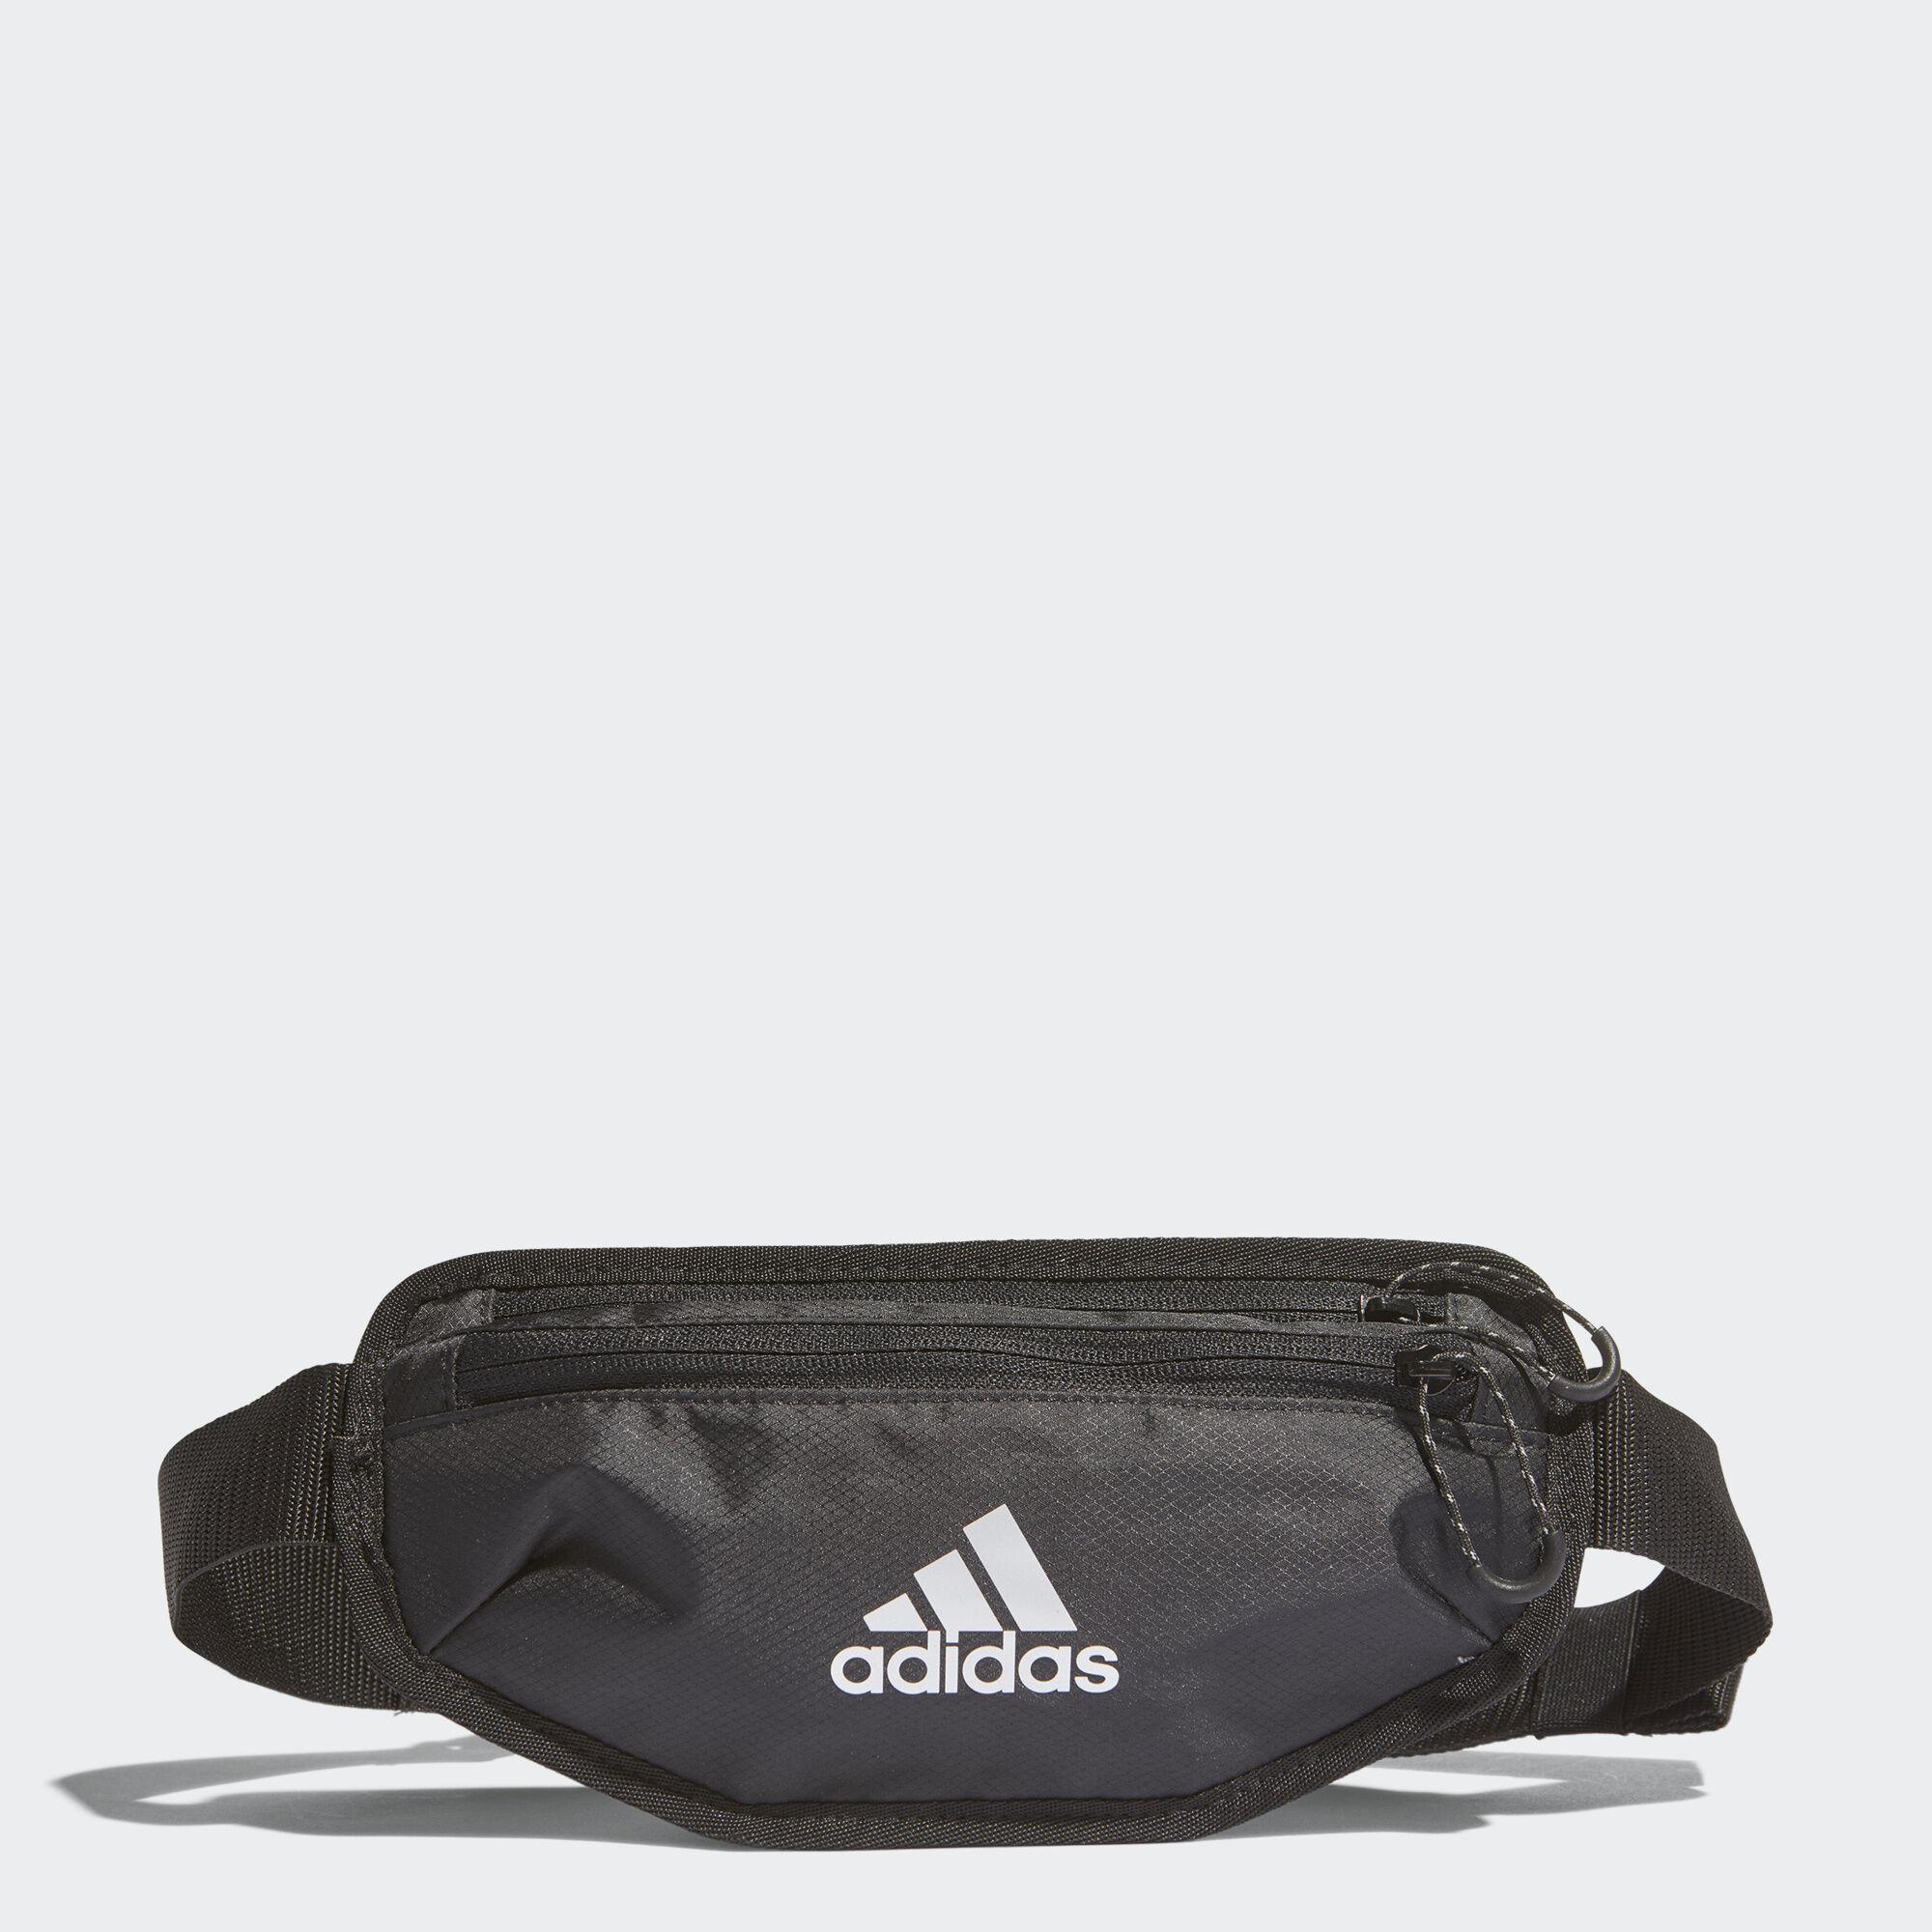 a958d1d115 Buy belt bag adidas   OFF54% Discounted